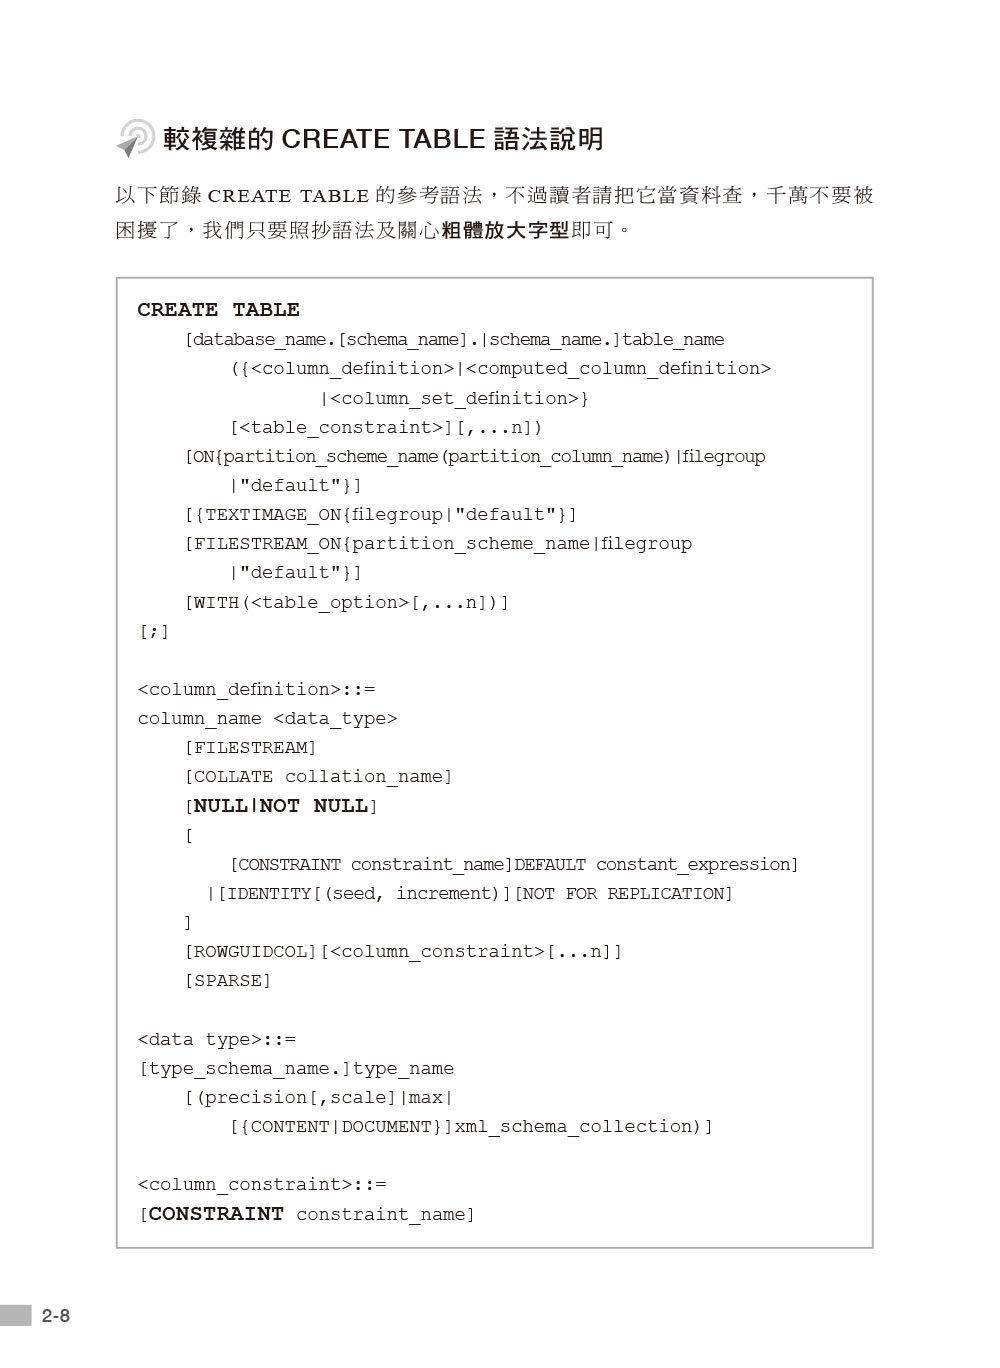 MTA Database Fundamentals 資料庫管理 國際認證教戰手冊 (98-364)-preview-10